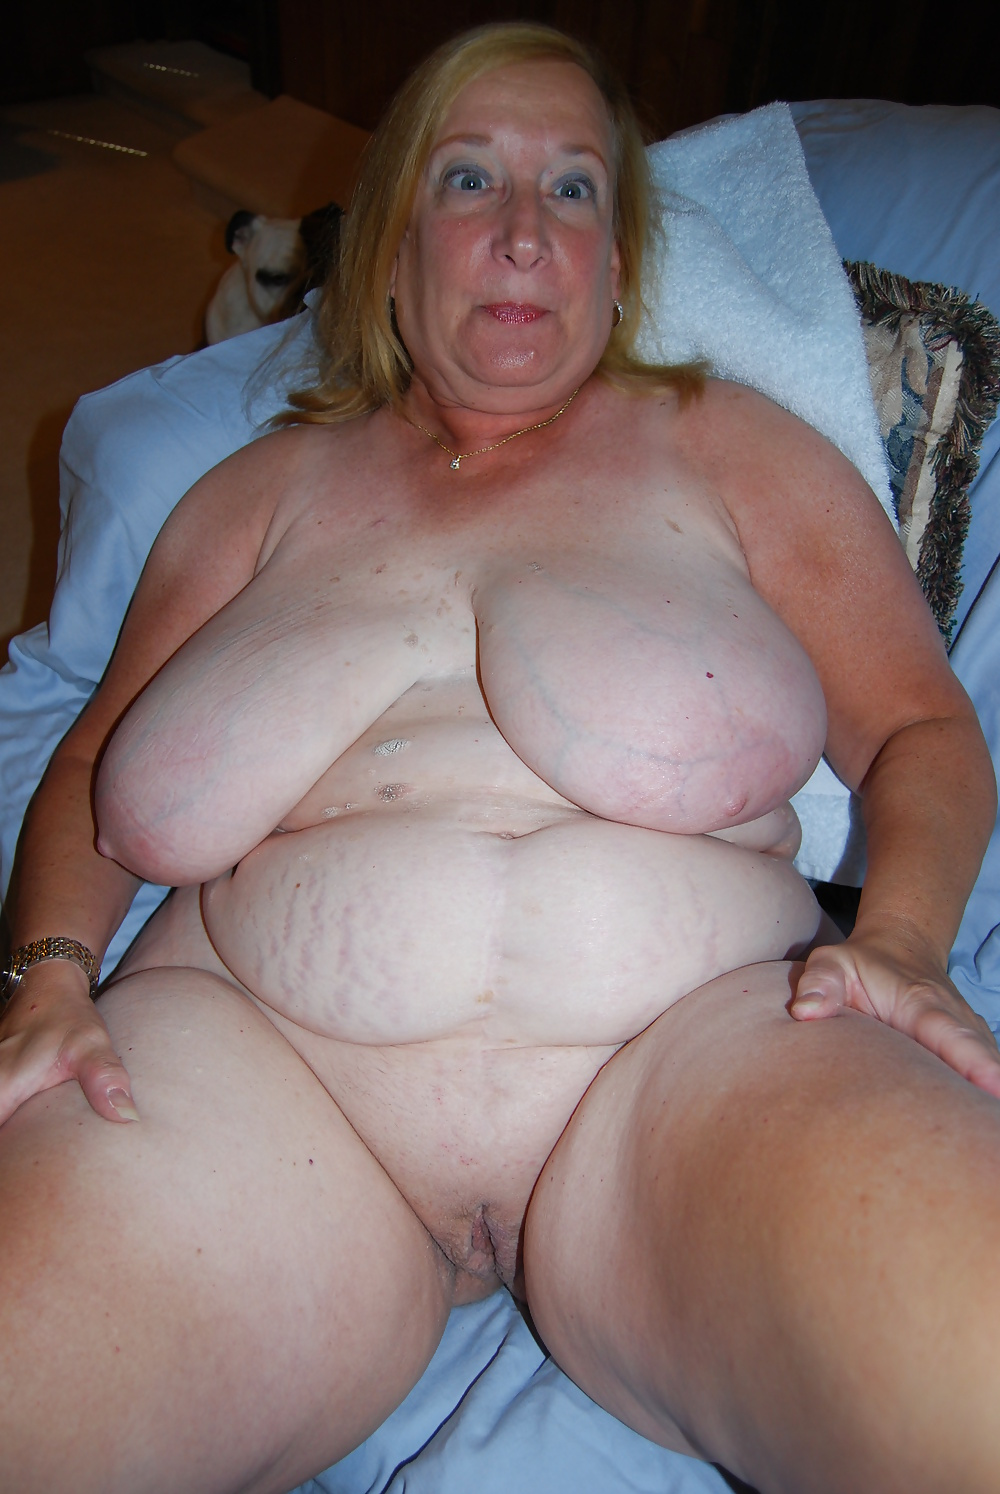 chubby-old-granny-tits-vidya-balan-sex-nangi-fucking-photos